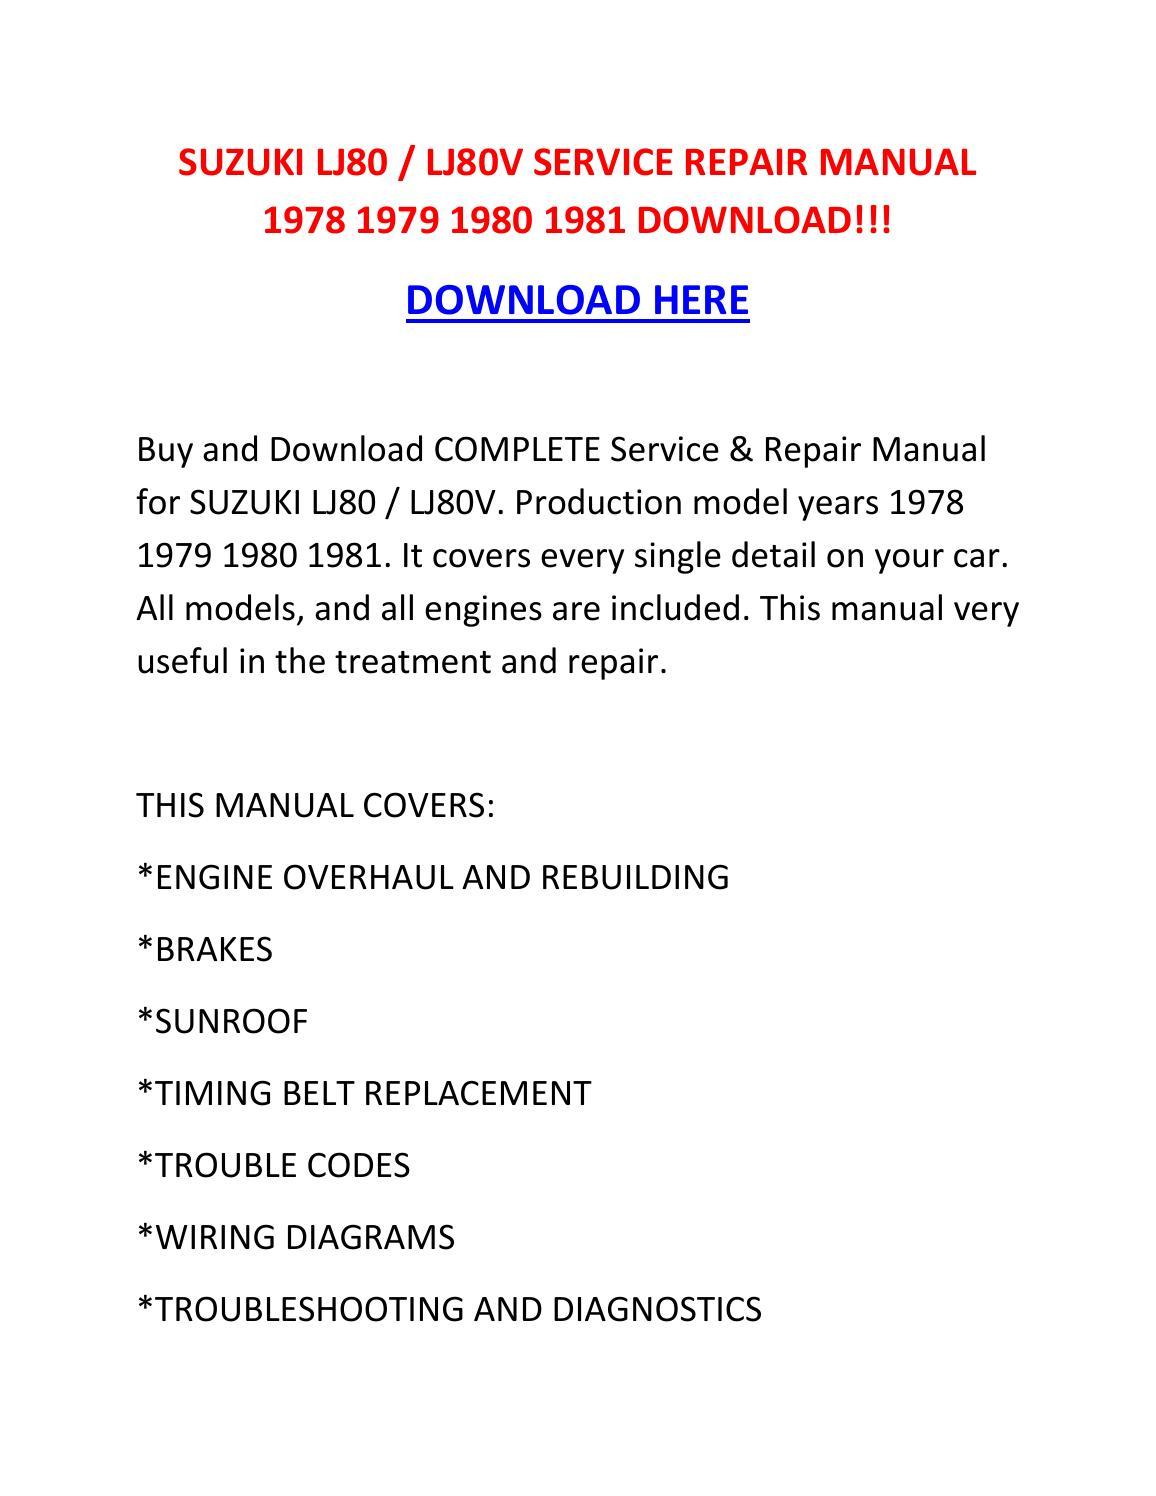 Suzuki Lj80 Lj80v Service Repair Manual 1978 1979 1980